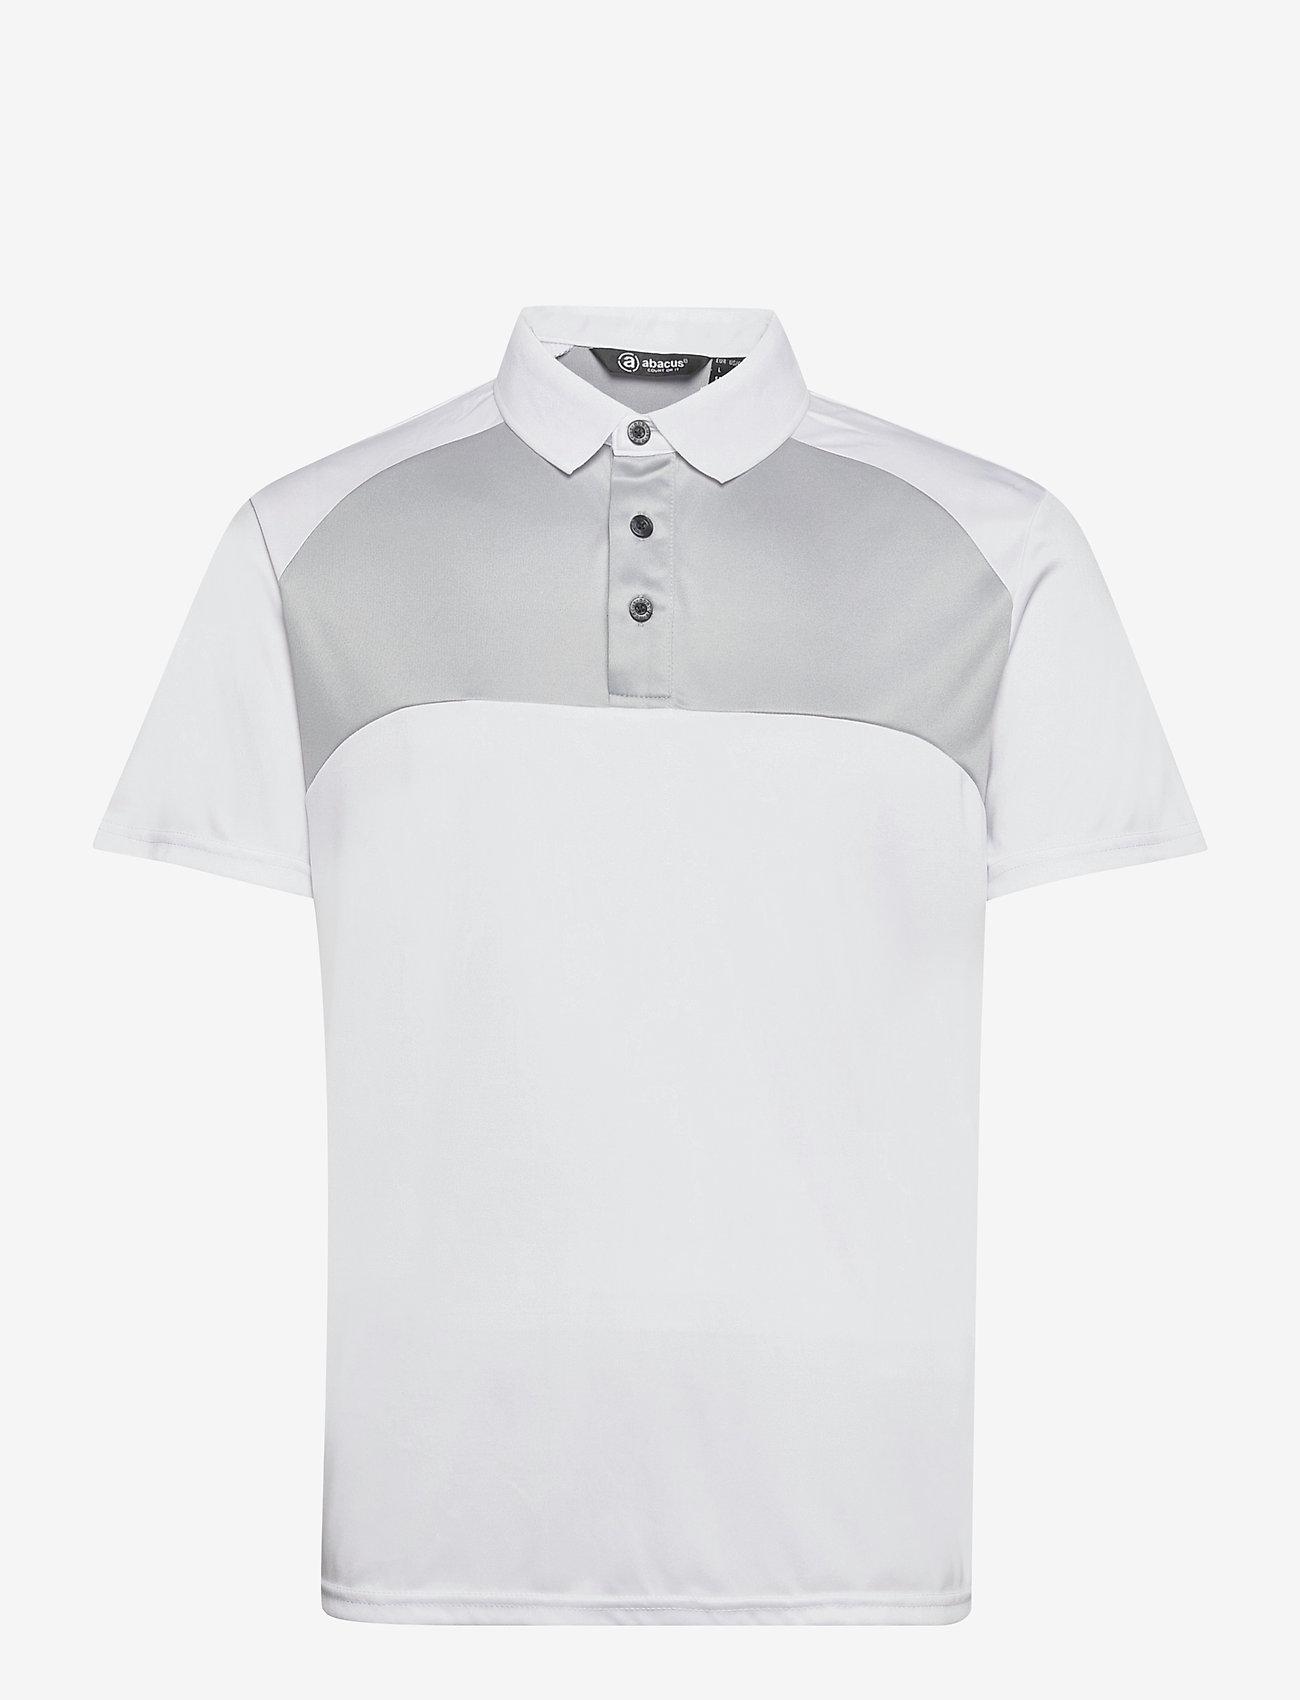 Abacus - Mens Pennard polo - t-shirts - white/lt.grey - 0